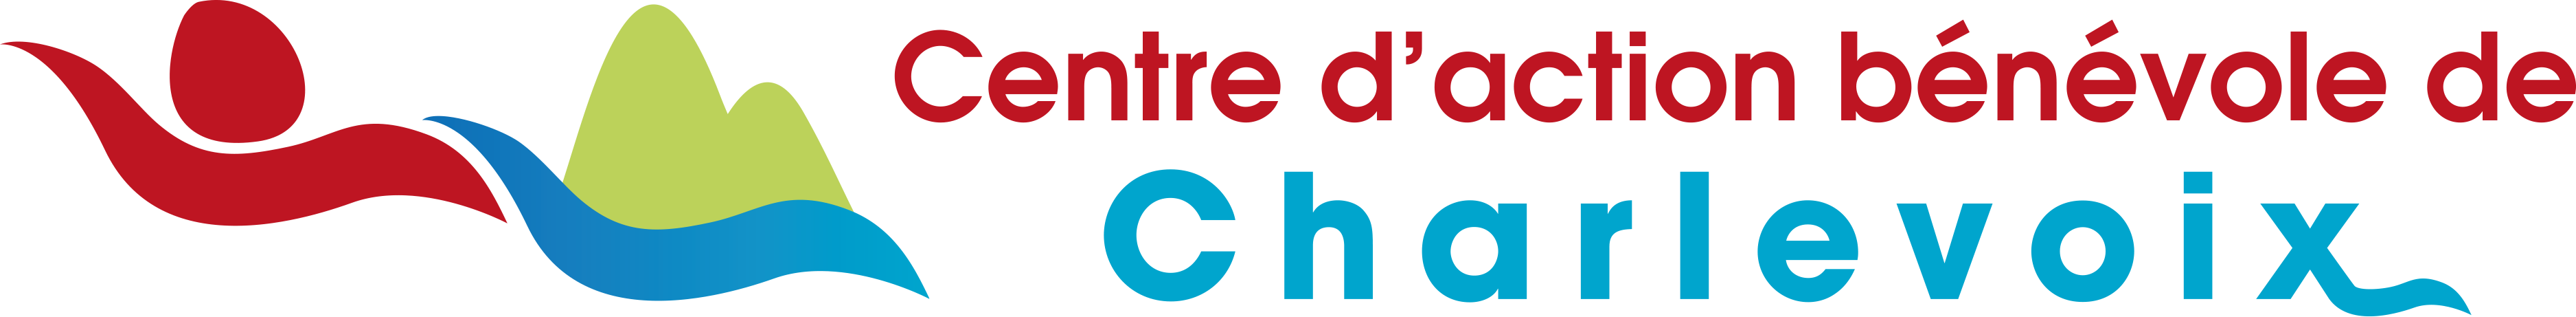 LogoCAB-Charlevoix-HORIZONTAL